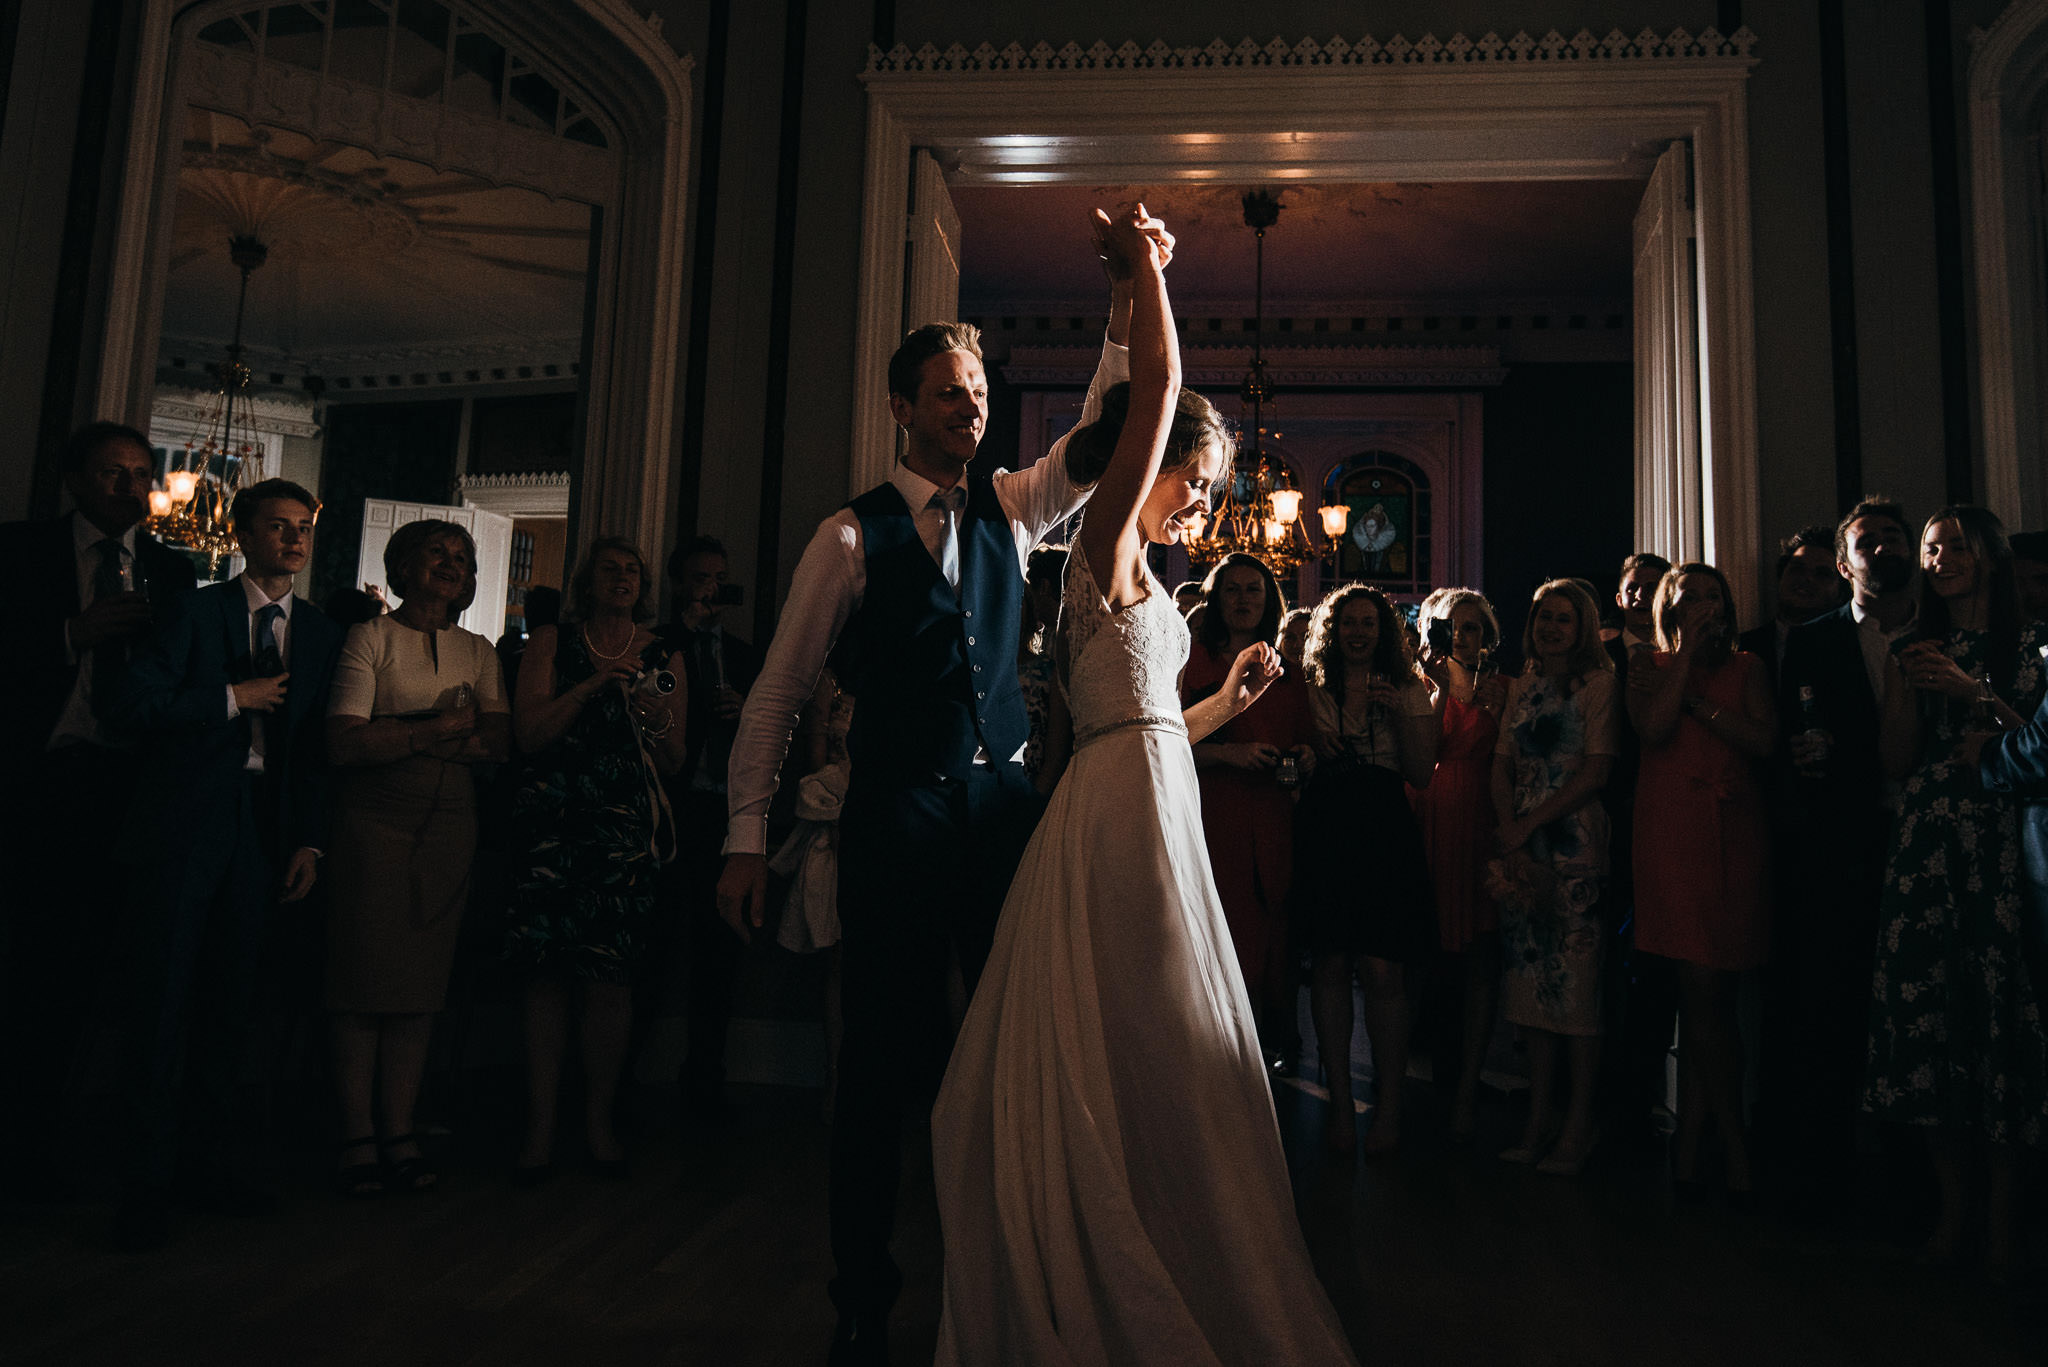 Nonsuch wedding venue simon biffen photography 8